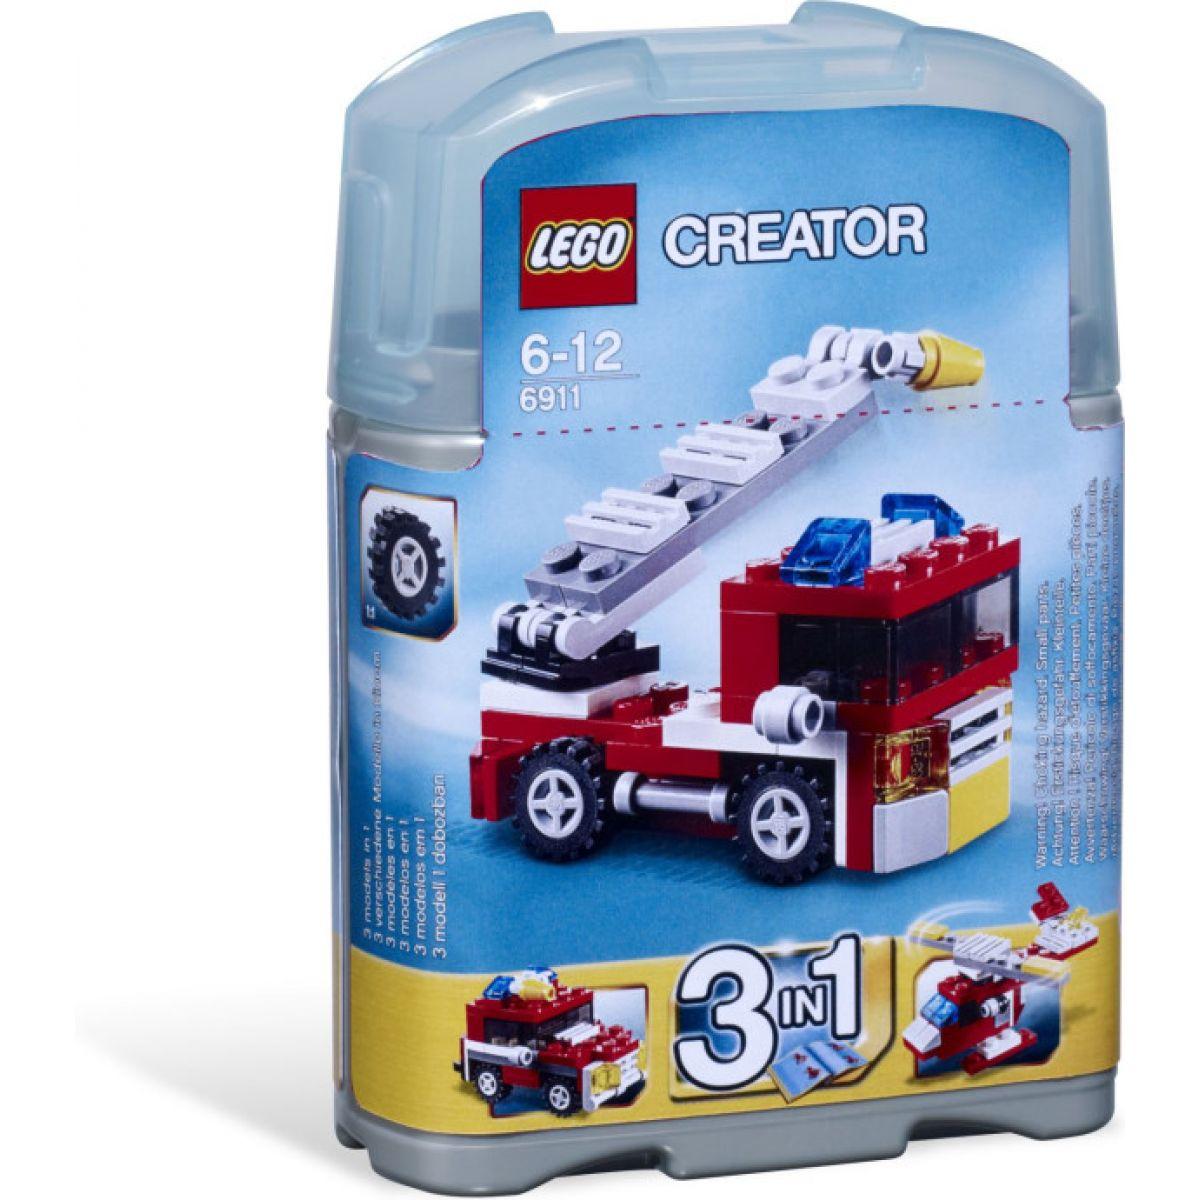 LEGO Creator 6911 Mini hasiči